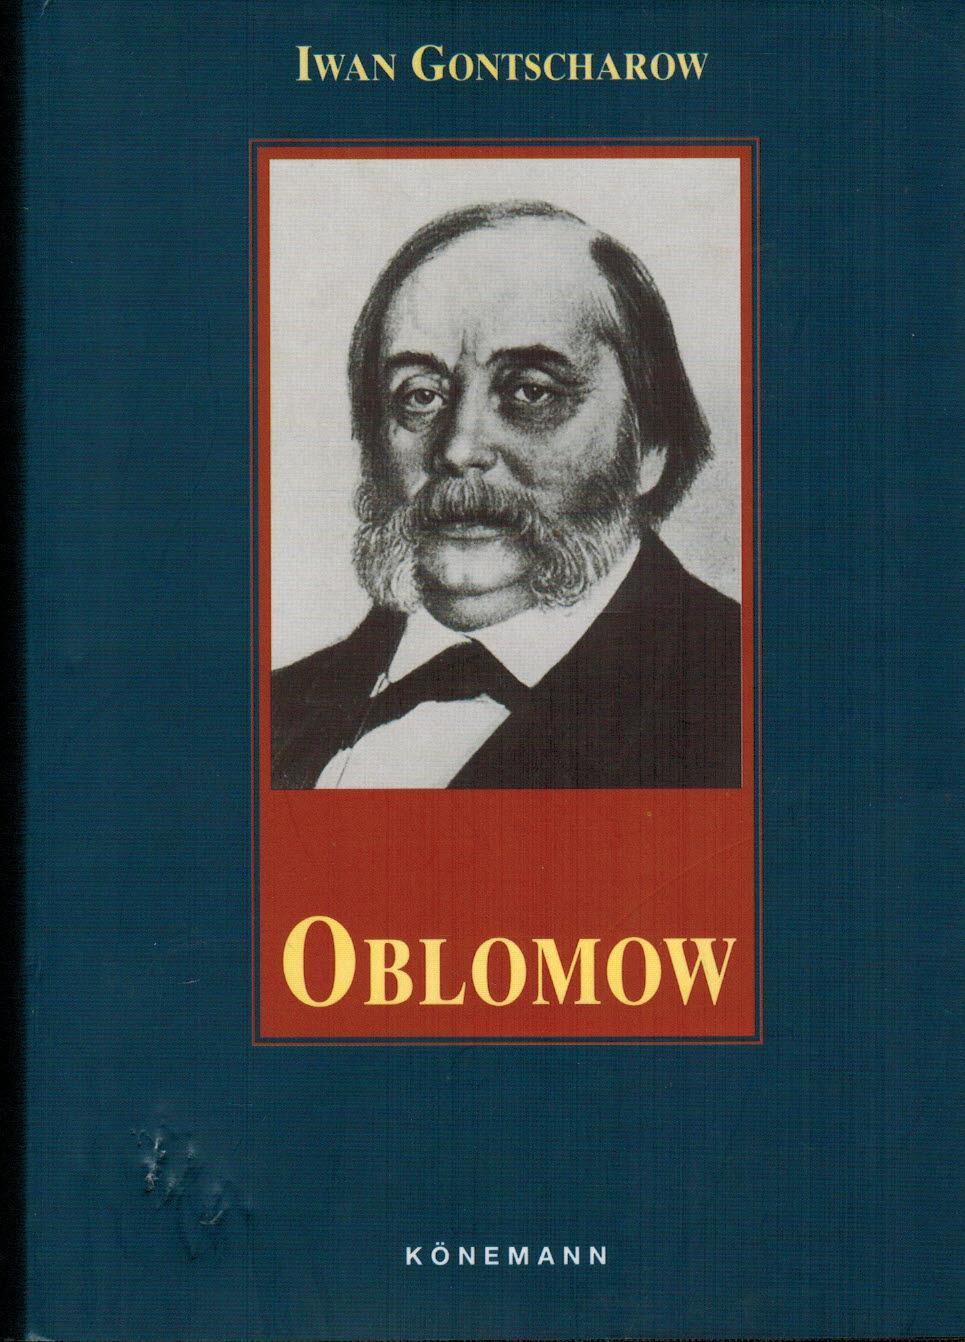 Oblomow: Gontscharow, Iwan Alexandrowitsch